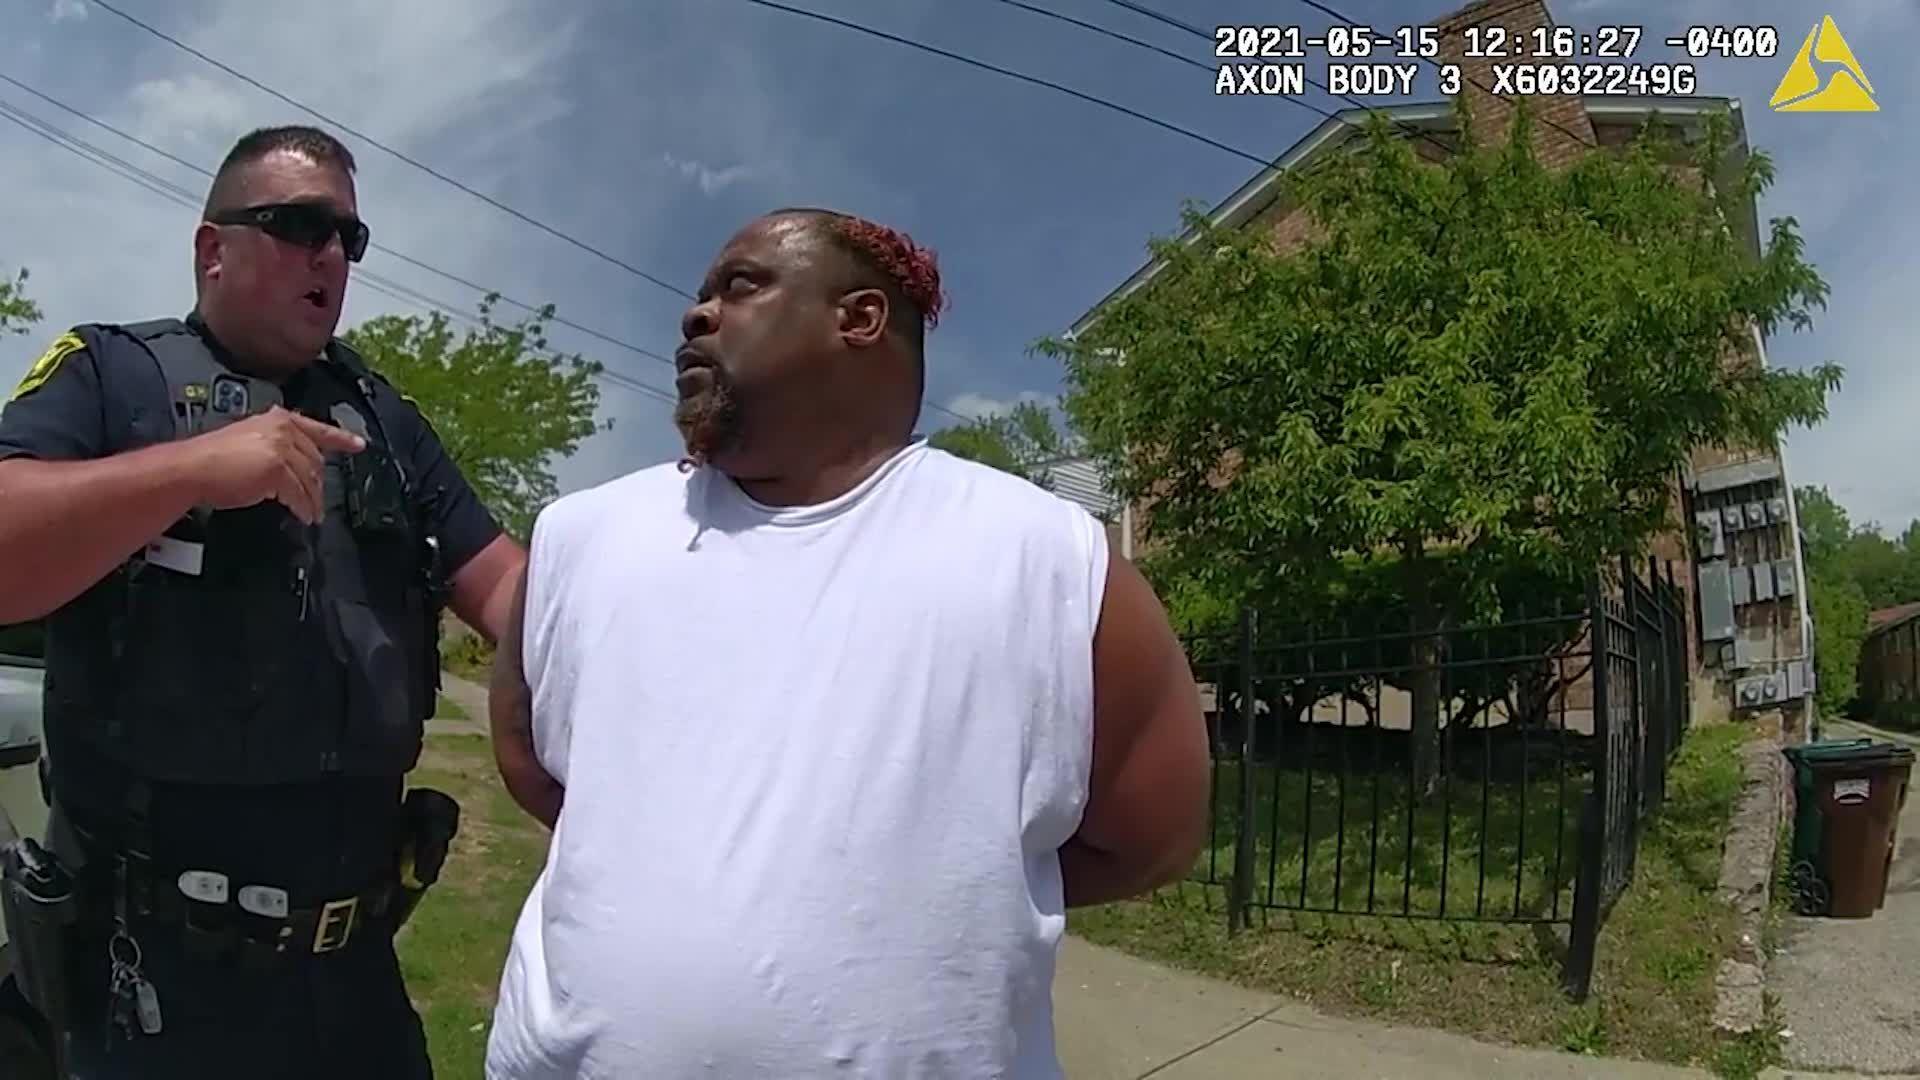 Cincinnati police body cam video shows tense encounter with peaceful ending